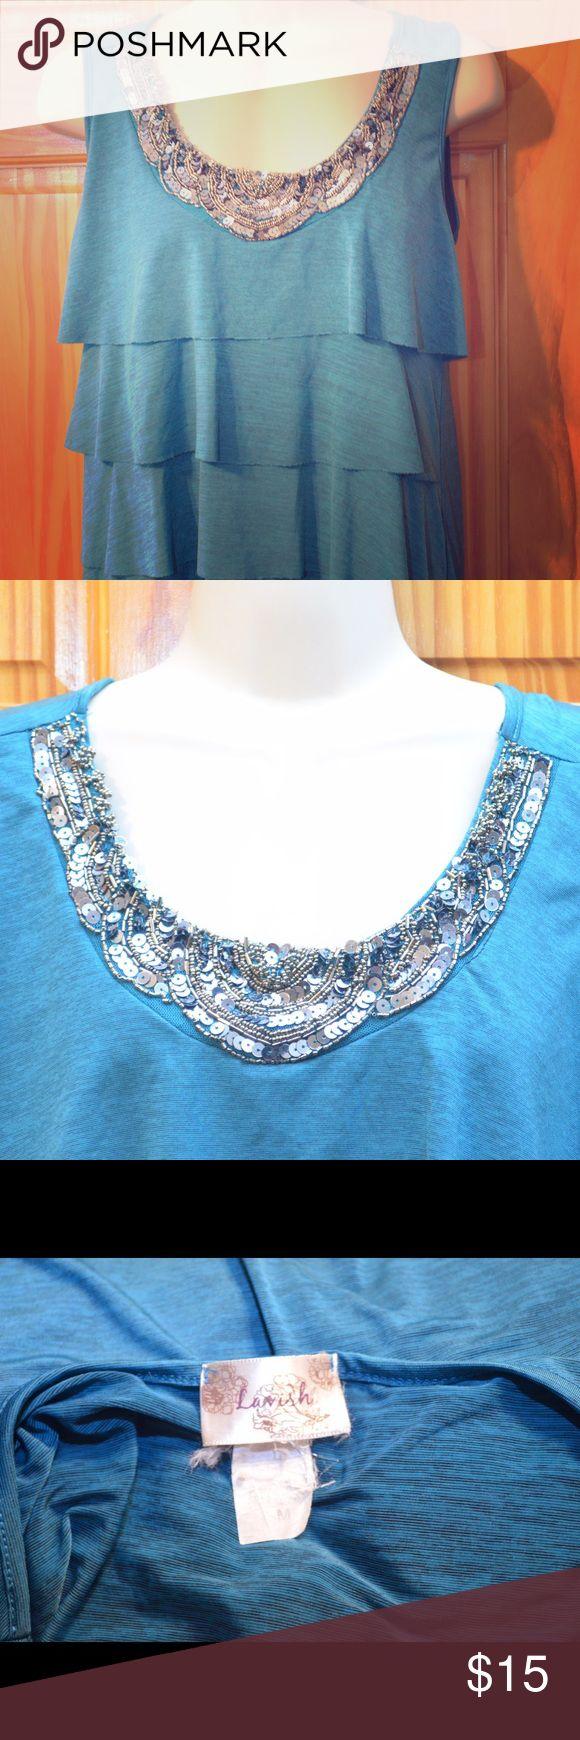 Lavish Turquoise Beaded Tiered Top Lavish Turquoise Beaded Tiered Top. Size M. Great condition. Anthropologie Tops Tank Tops